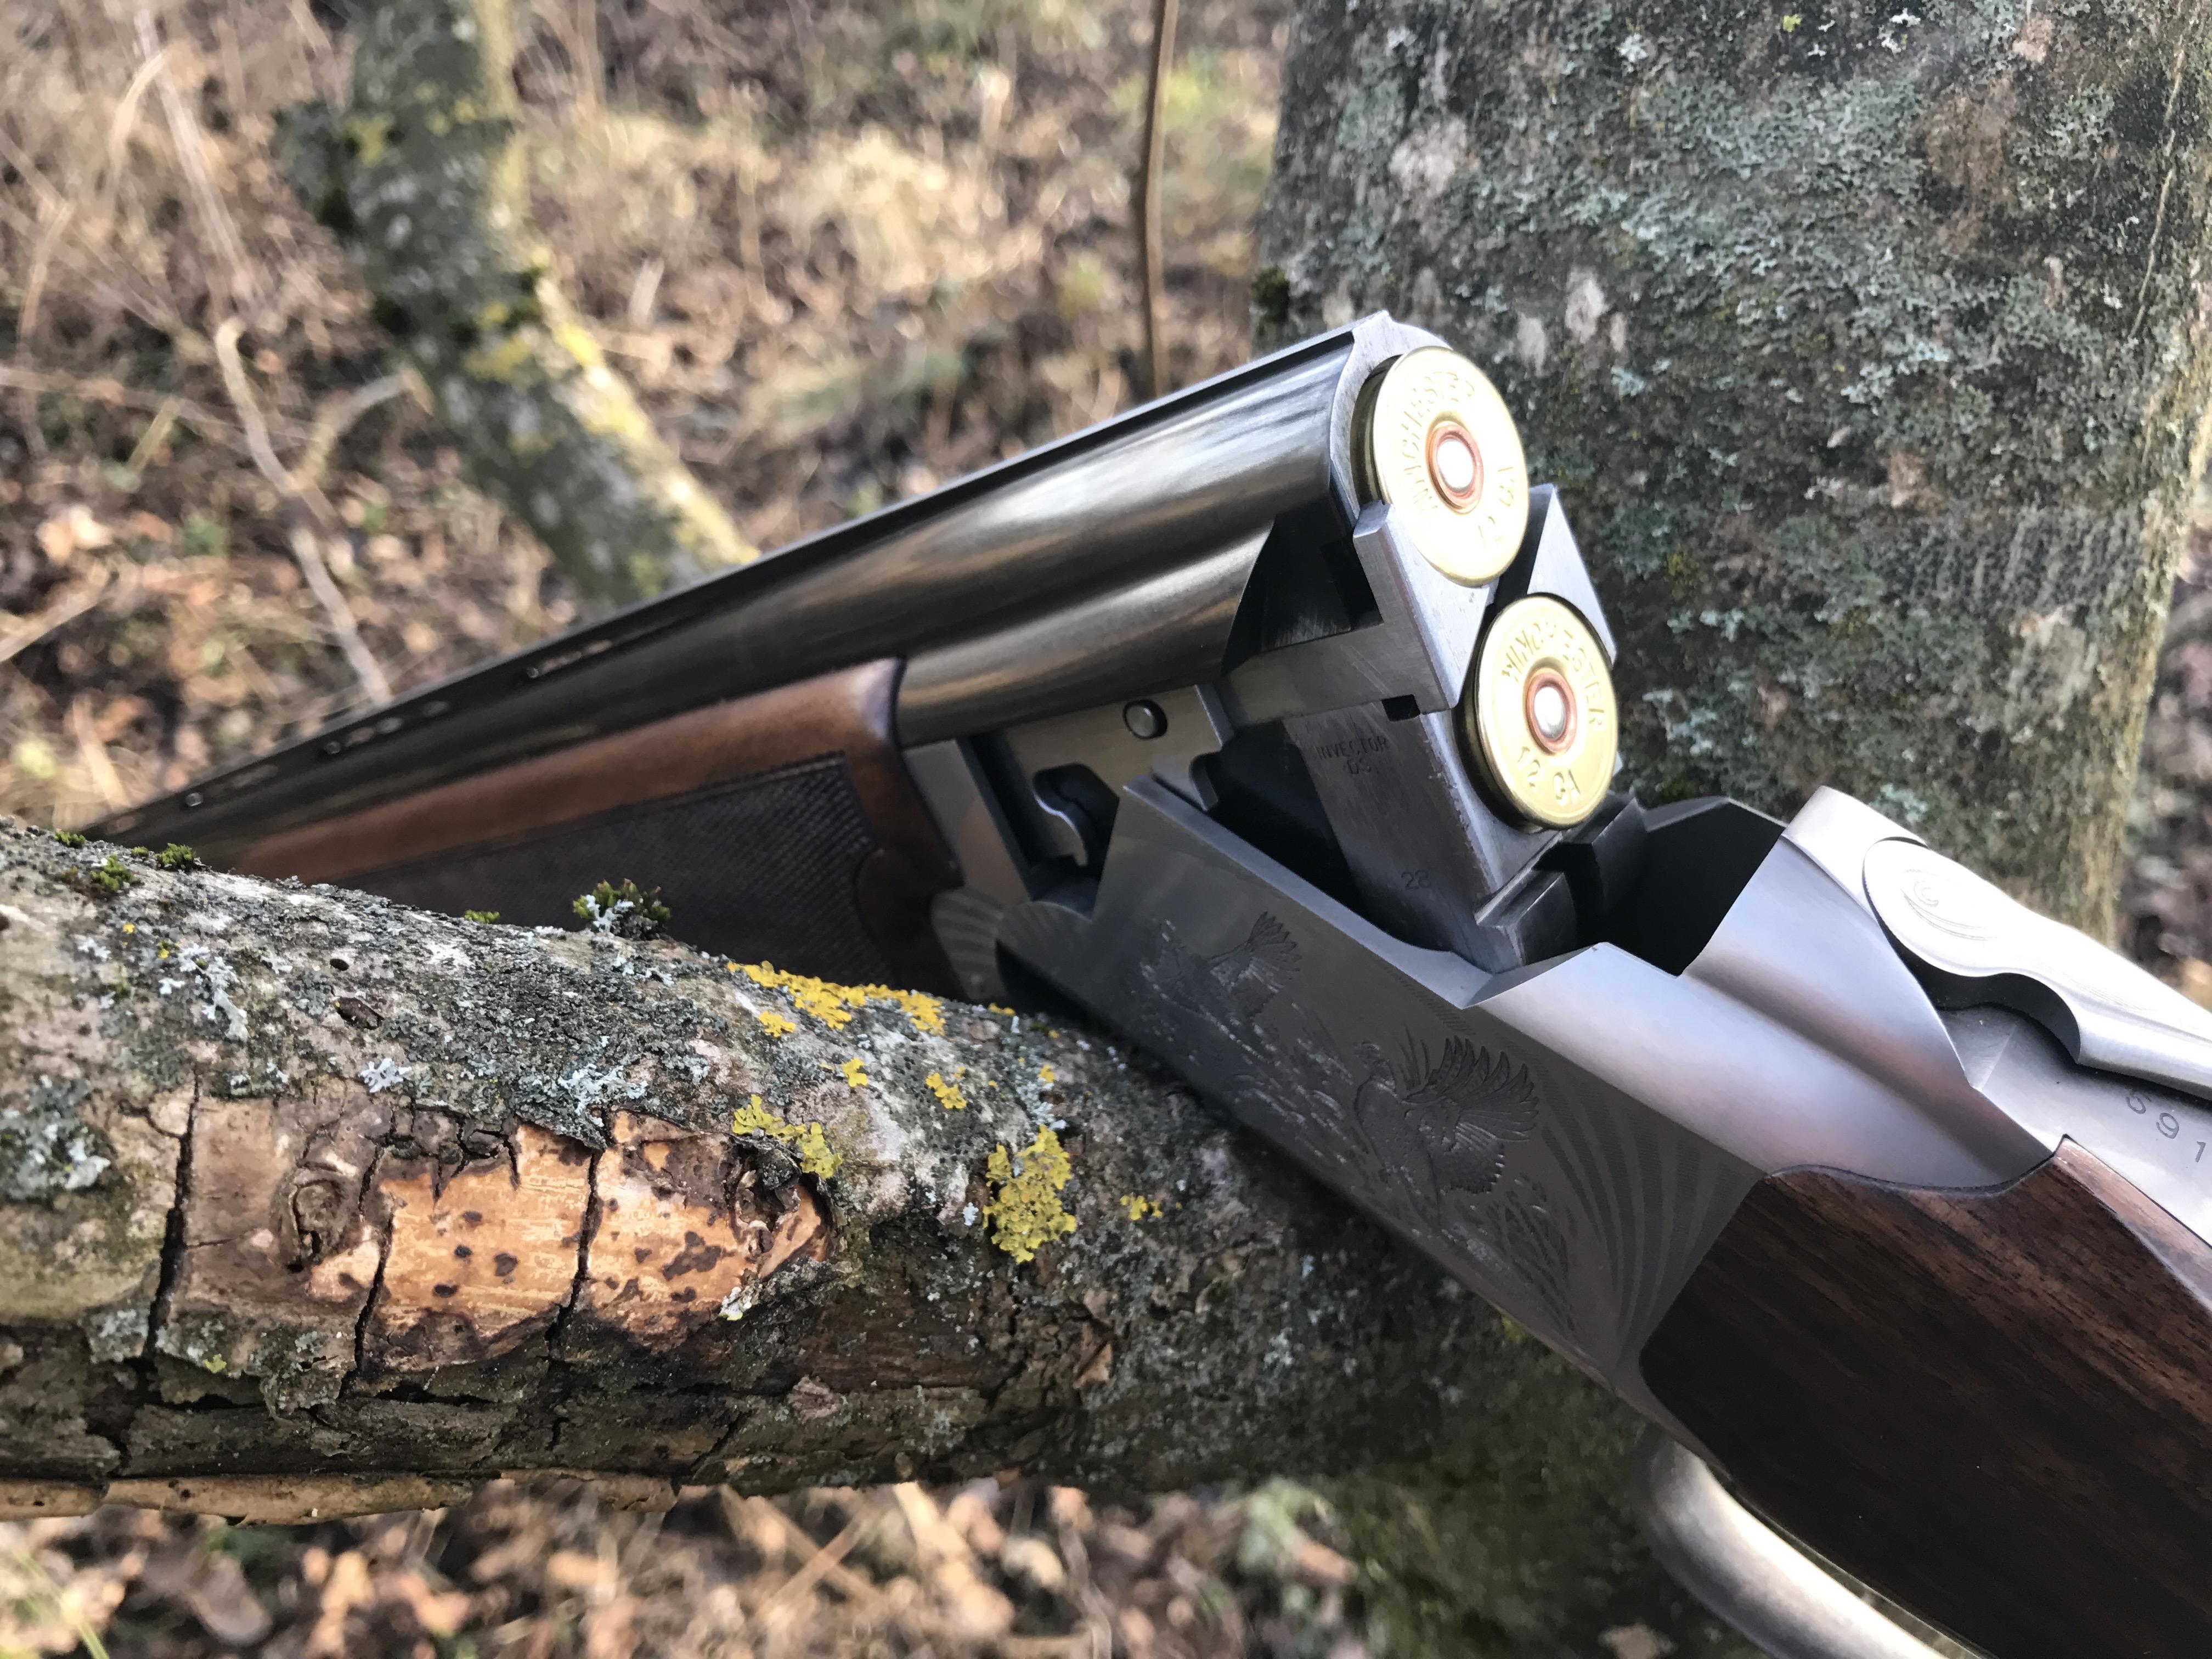 Vollmond Jagd Entfernungsmesser : Erfahrungsbericht u jagd und natur